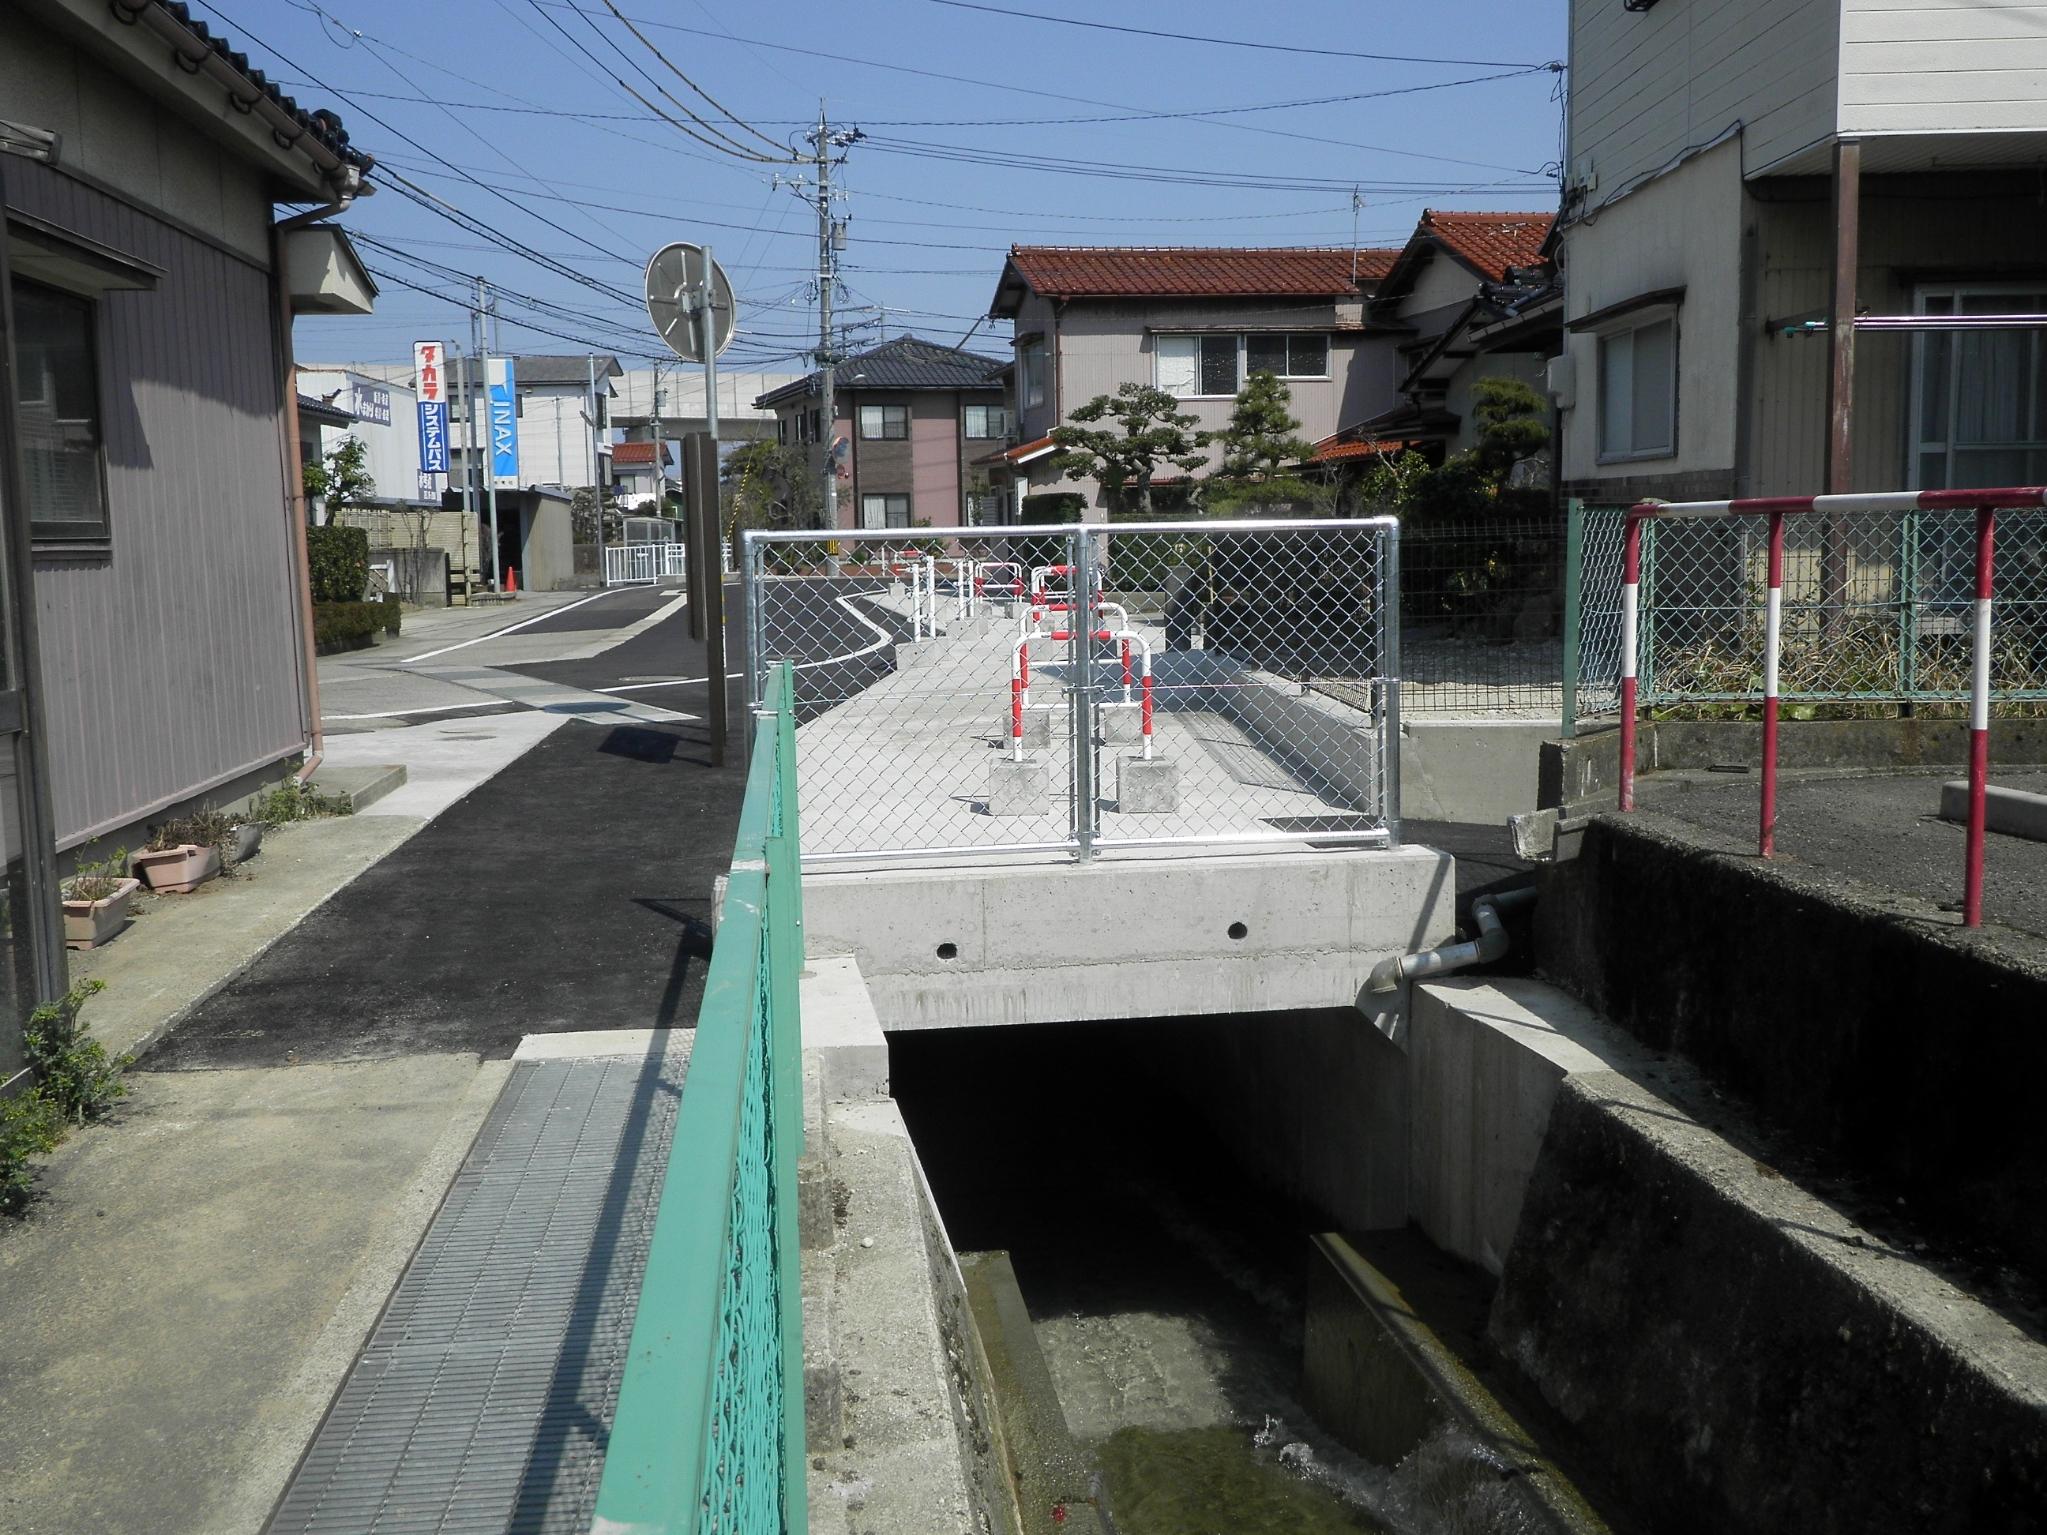 平成28年度 県営かんがい排水事業 中村用水第2三期地区 水路工事